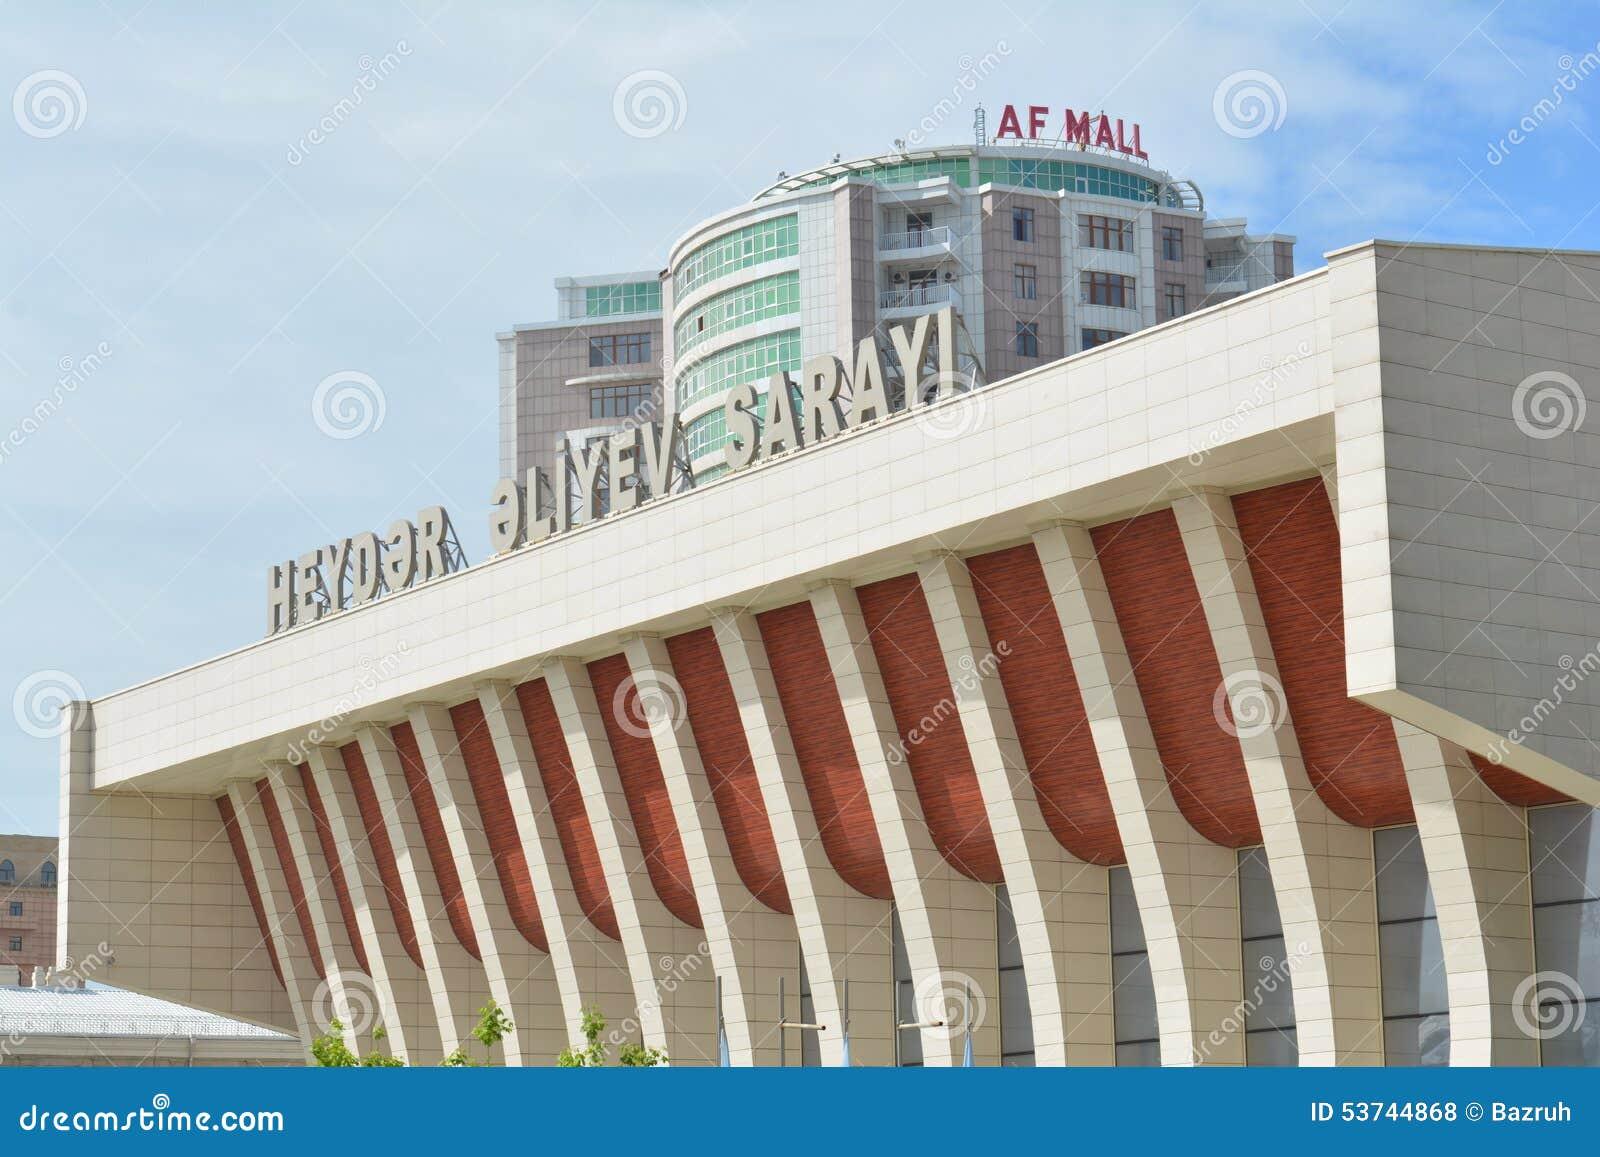 Architecture of Baku, Heydar Aliyev Palace